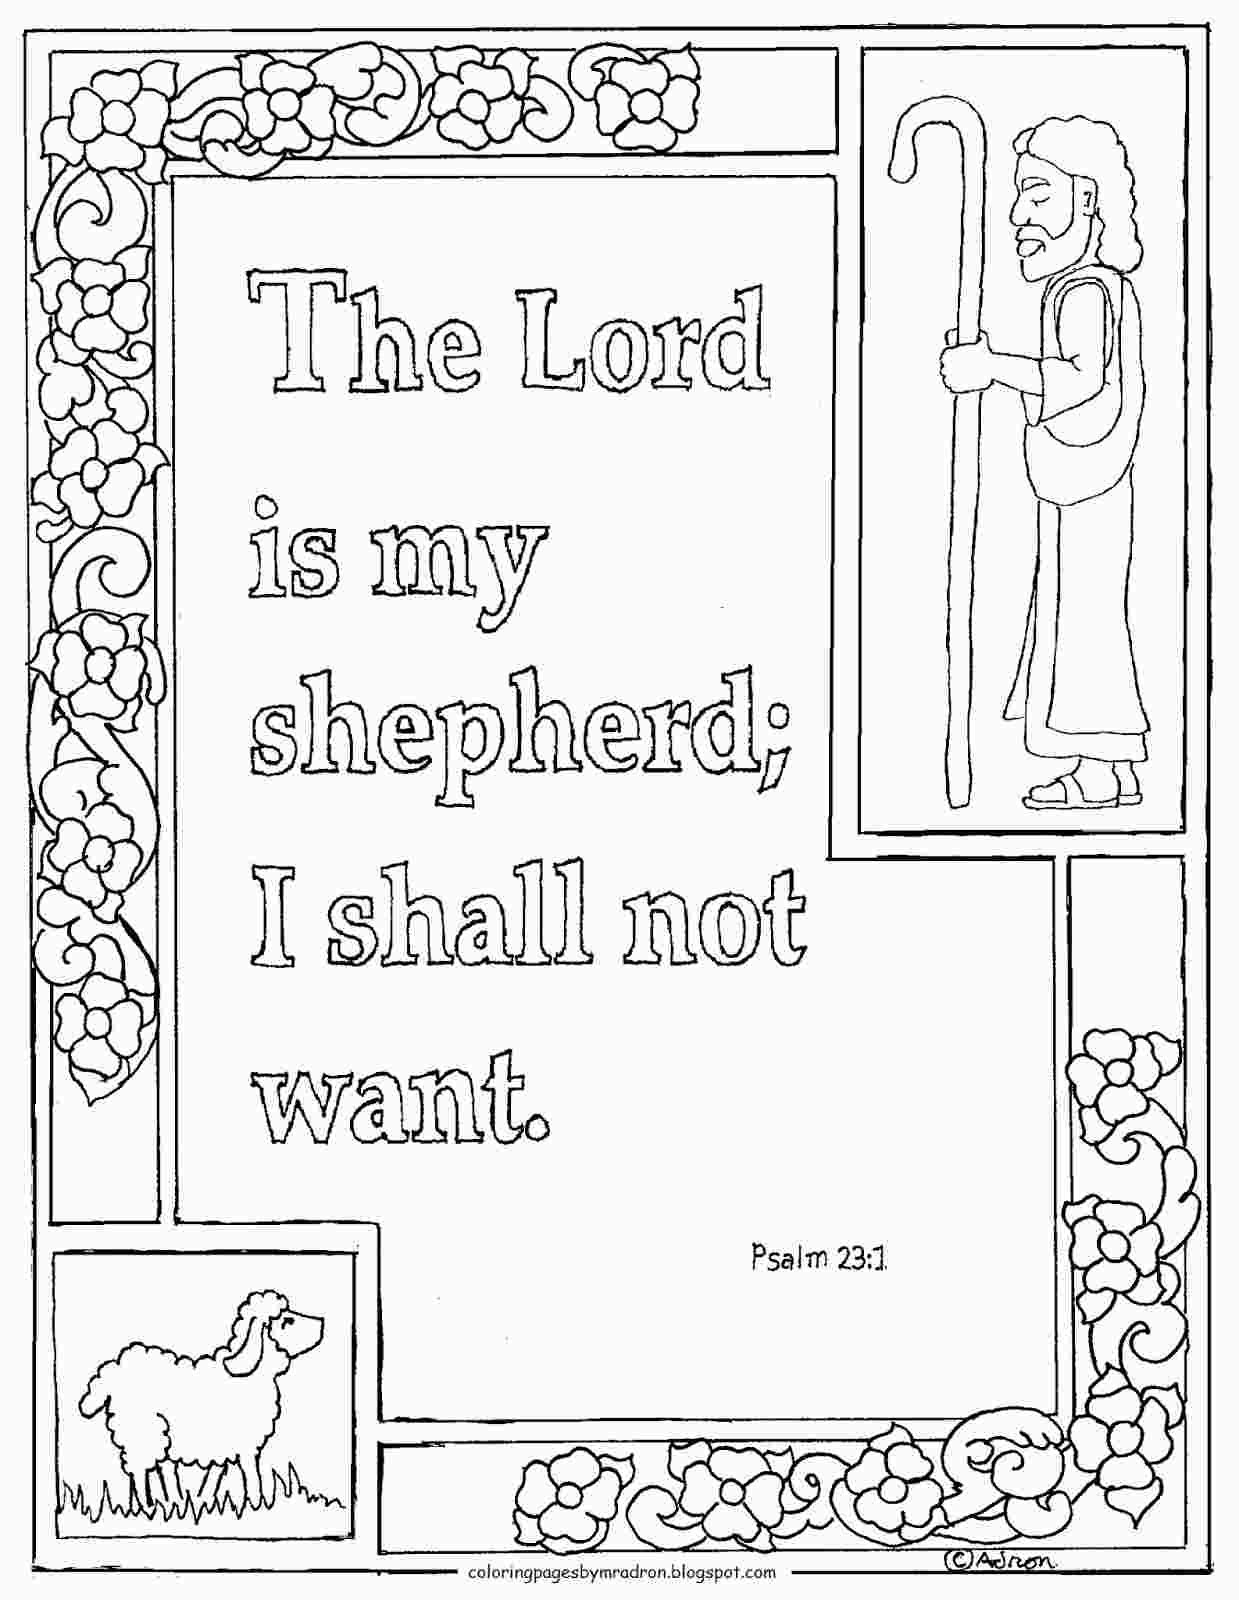 Psalm 23 Coloring Sheet Printable Sunday School Coloring Pages Bible Coloring Pages Lord Is My Shepherd